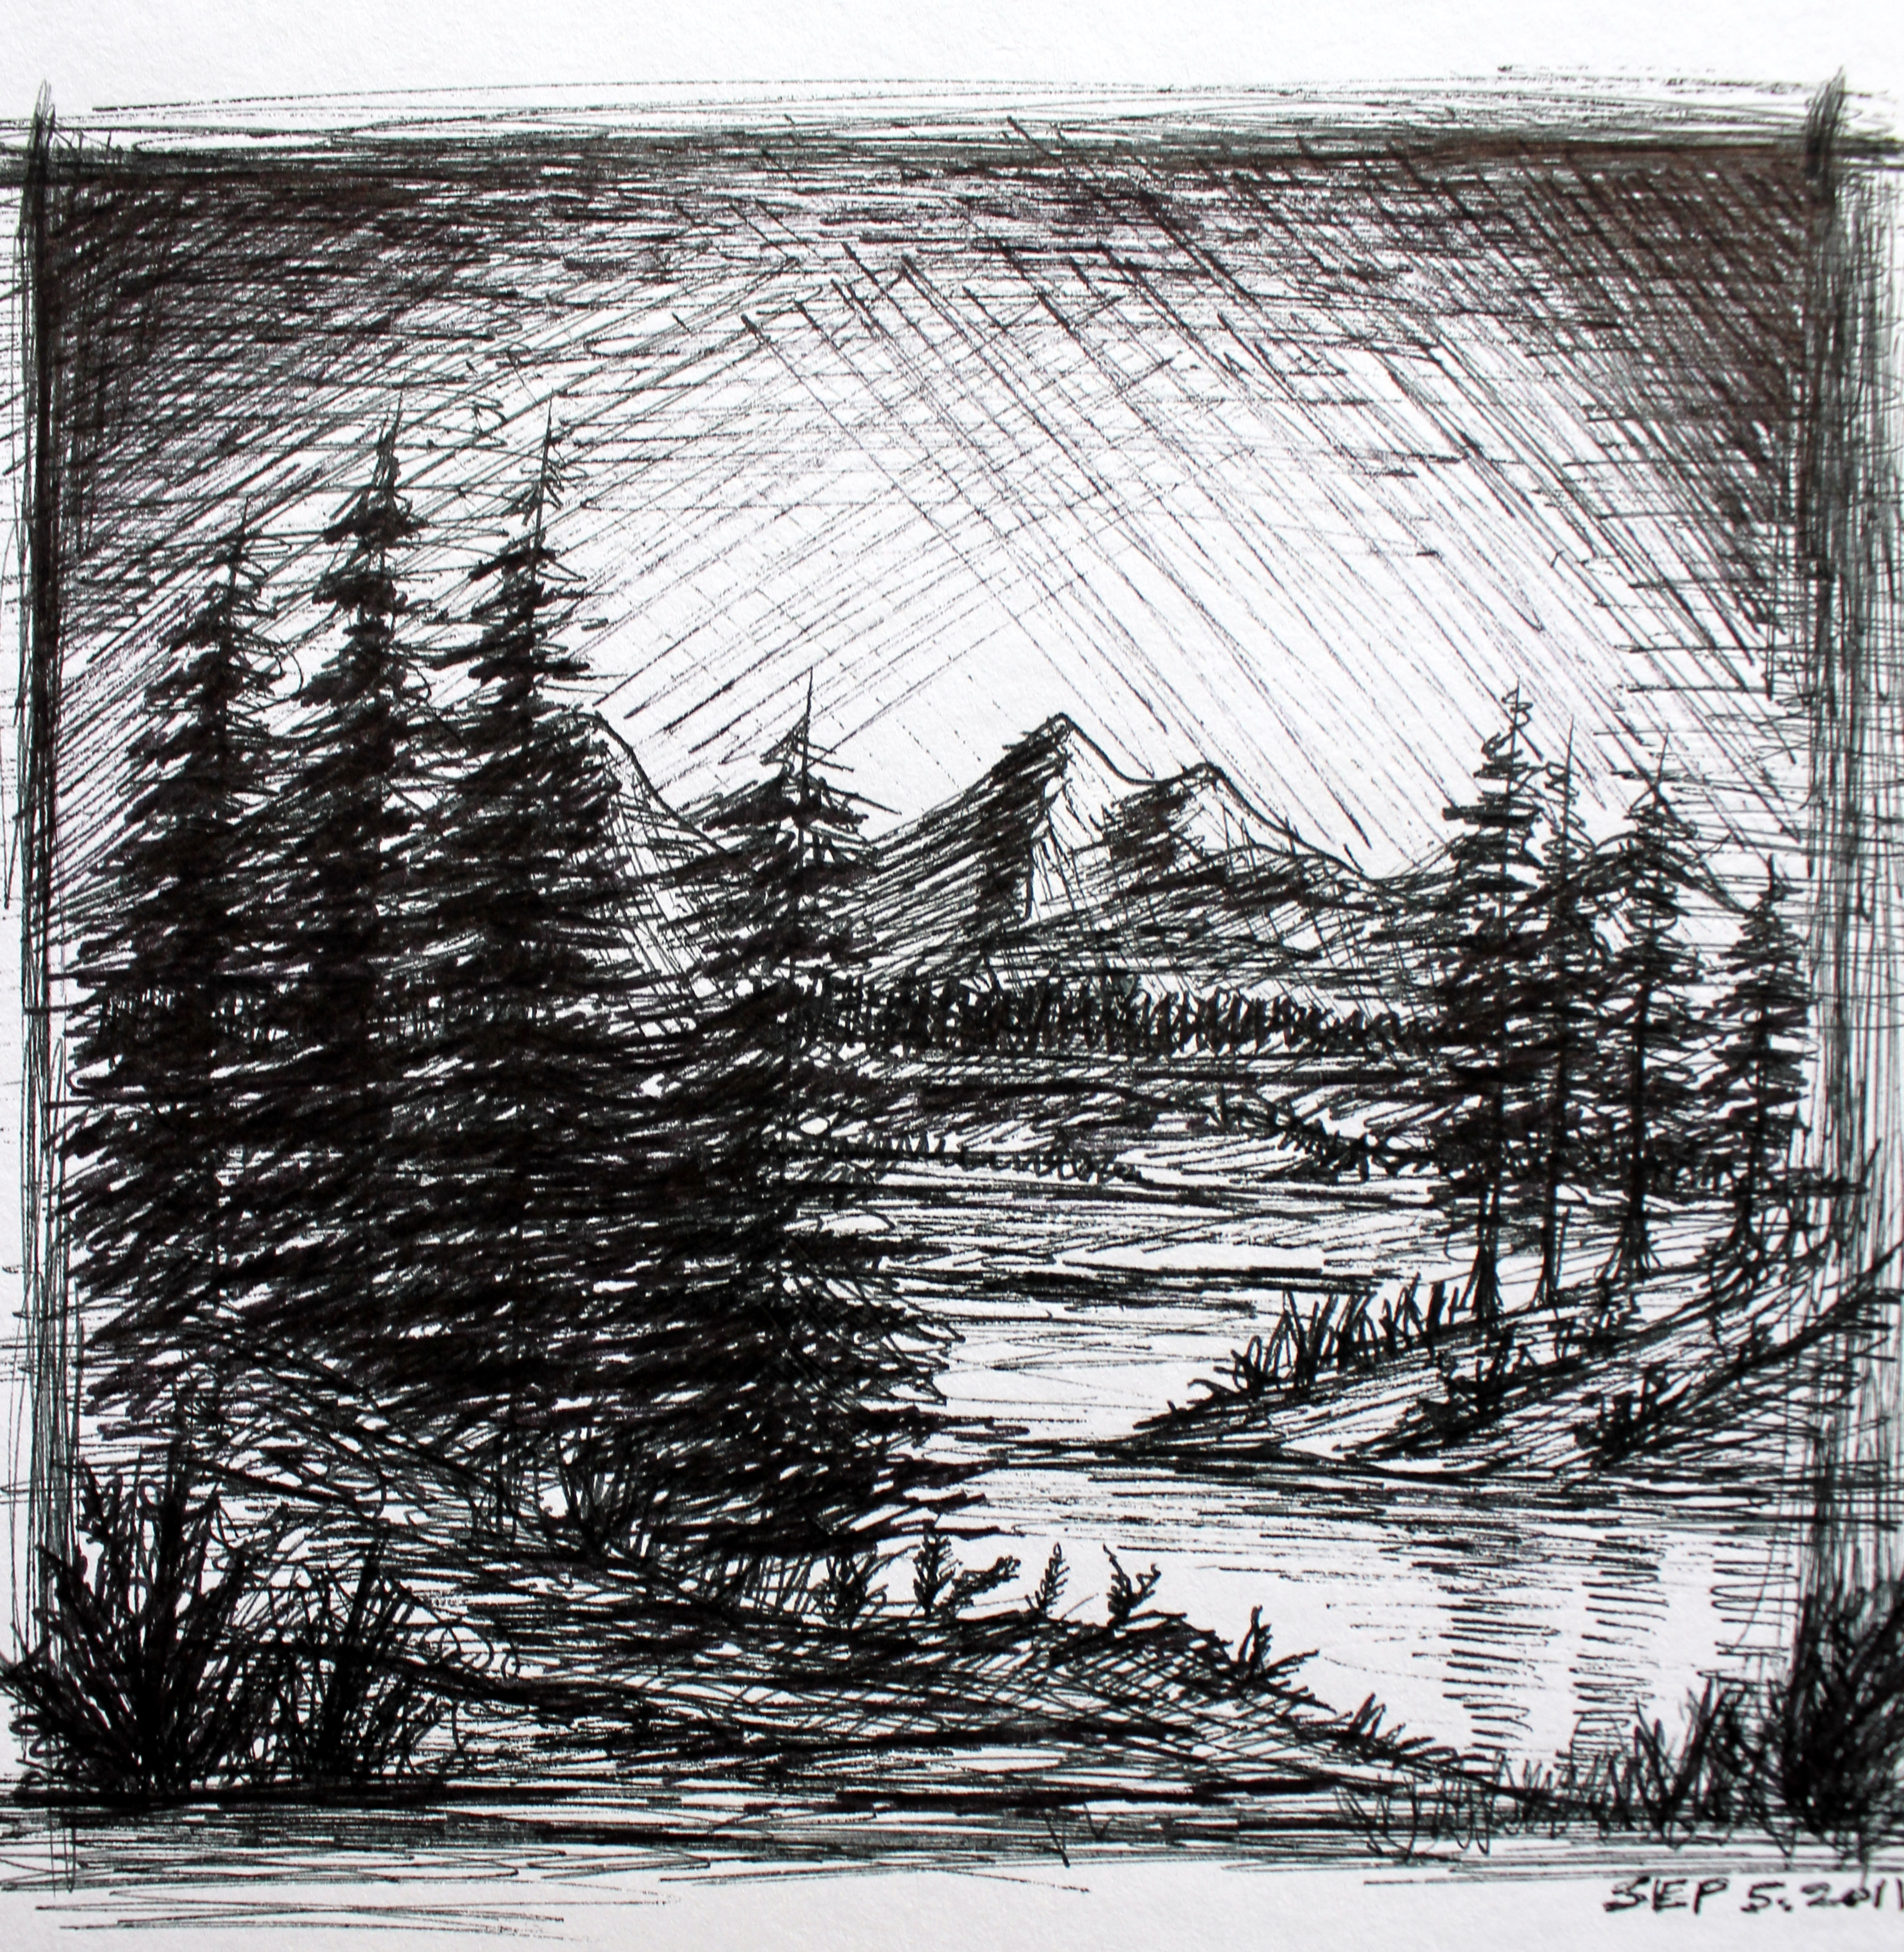 Drawn scenic black pen Pen sketch  Sketches Artwork